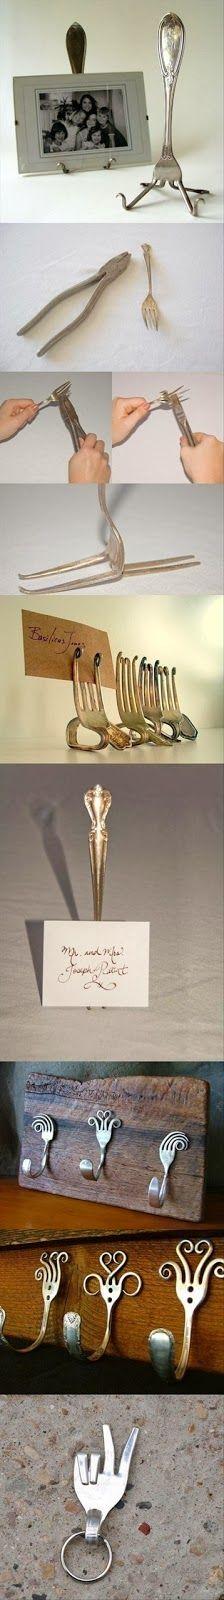 Amazing Ways to Repurpose Old Items